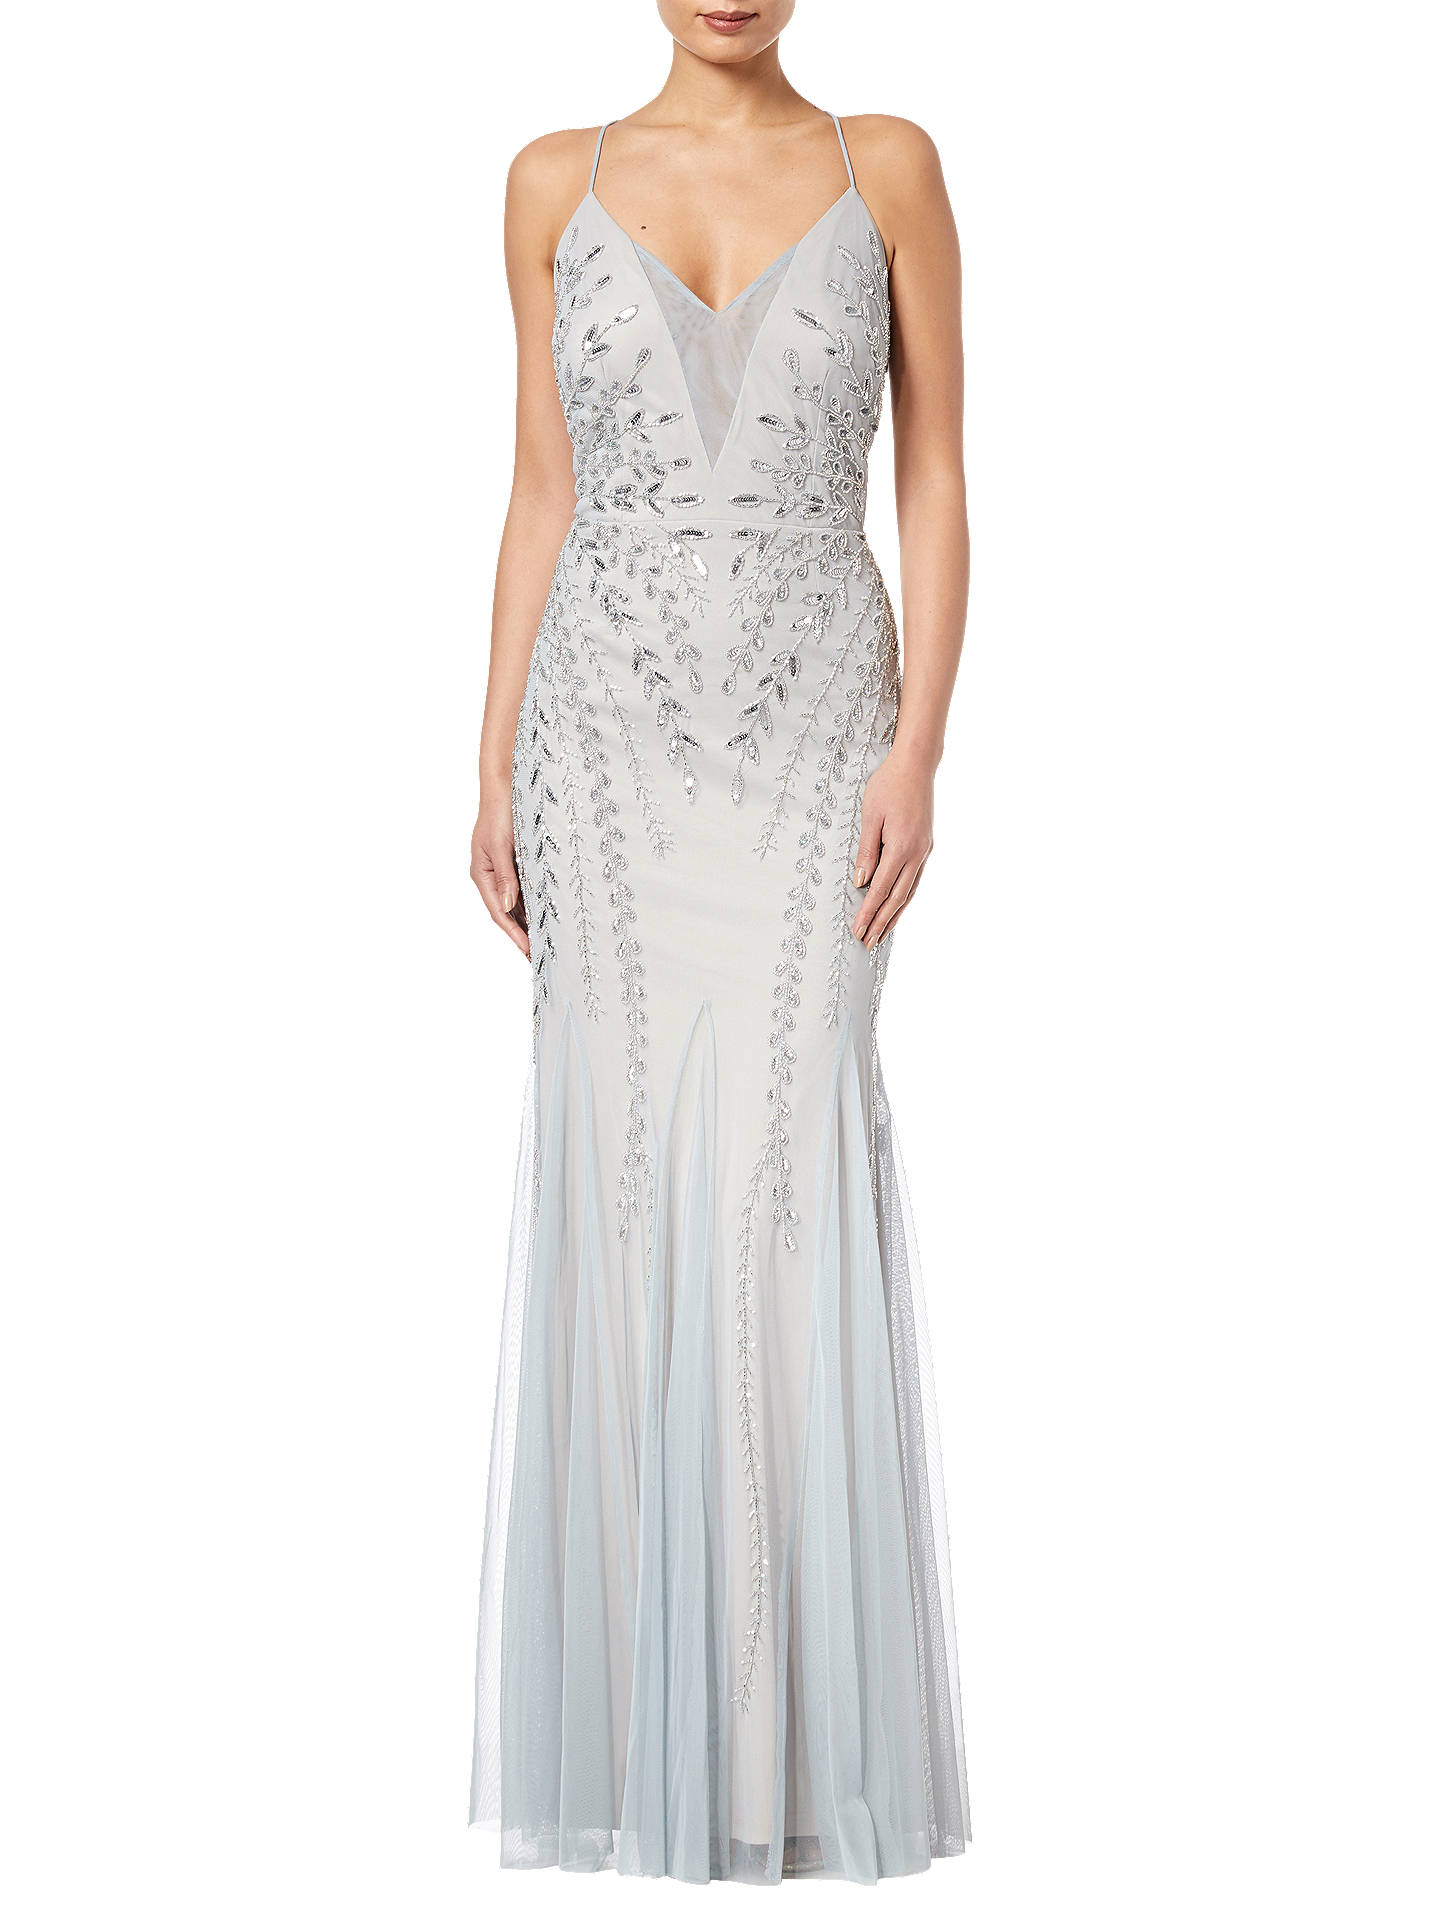 35956bf59fea Buy Adrianna Papell Bead Mesh Long Dress